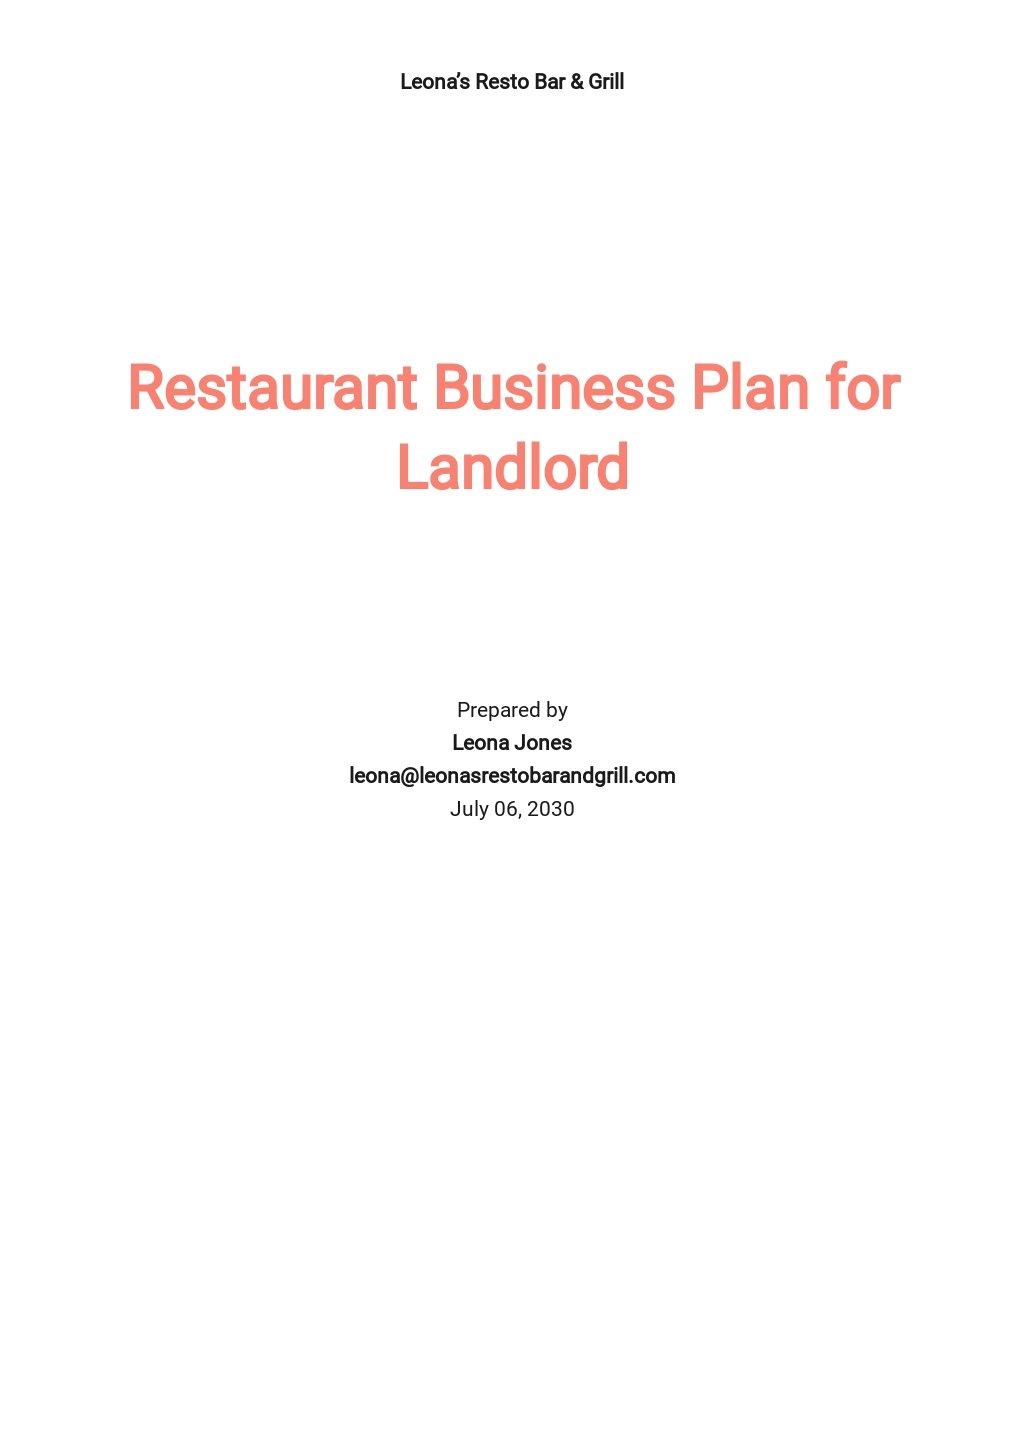 Restaurant Business Plan for Landlord Template